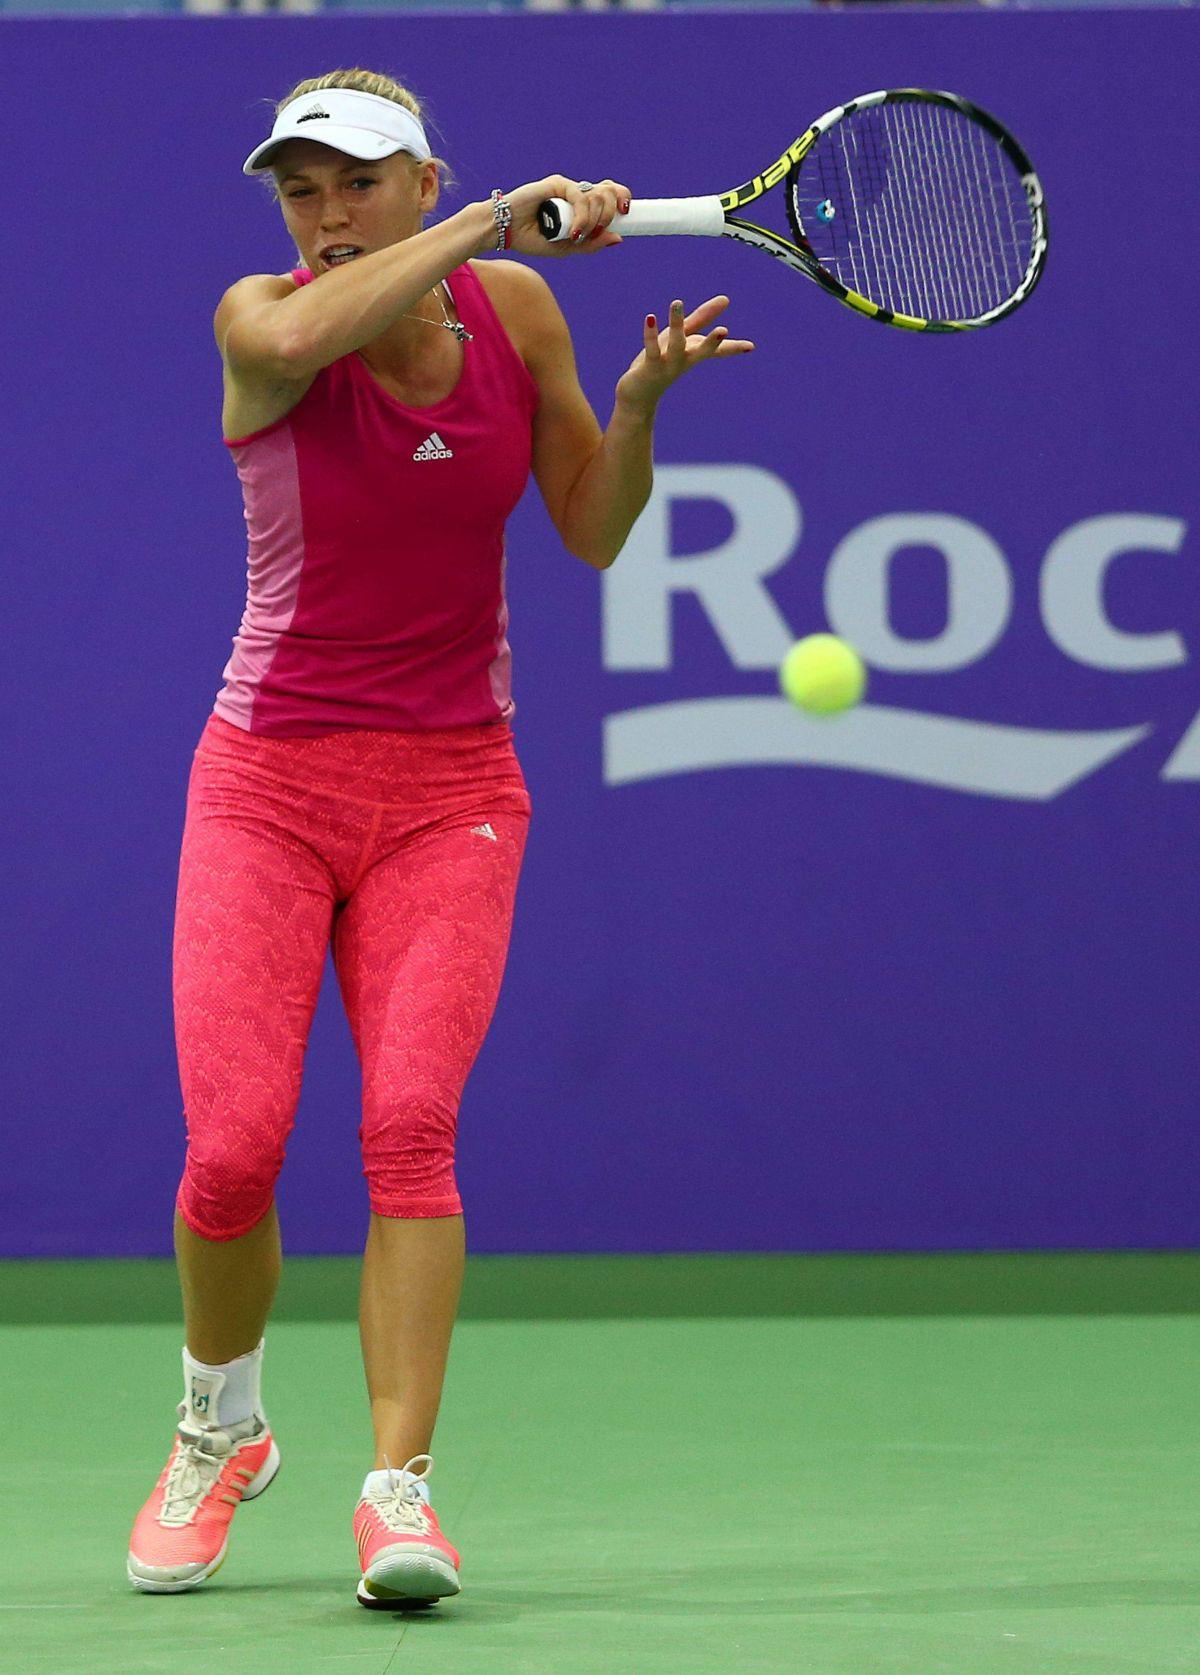 CAROLINE WOZNIACKI at Practice Session at BNP Paribas WTA Finals in Singapore